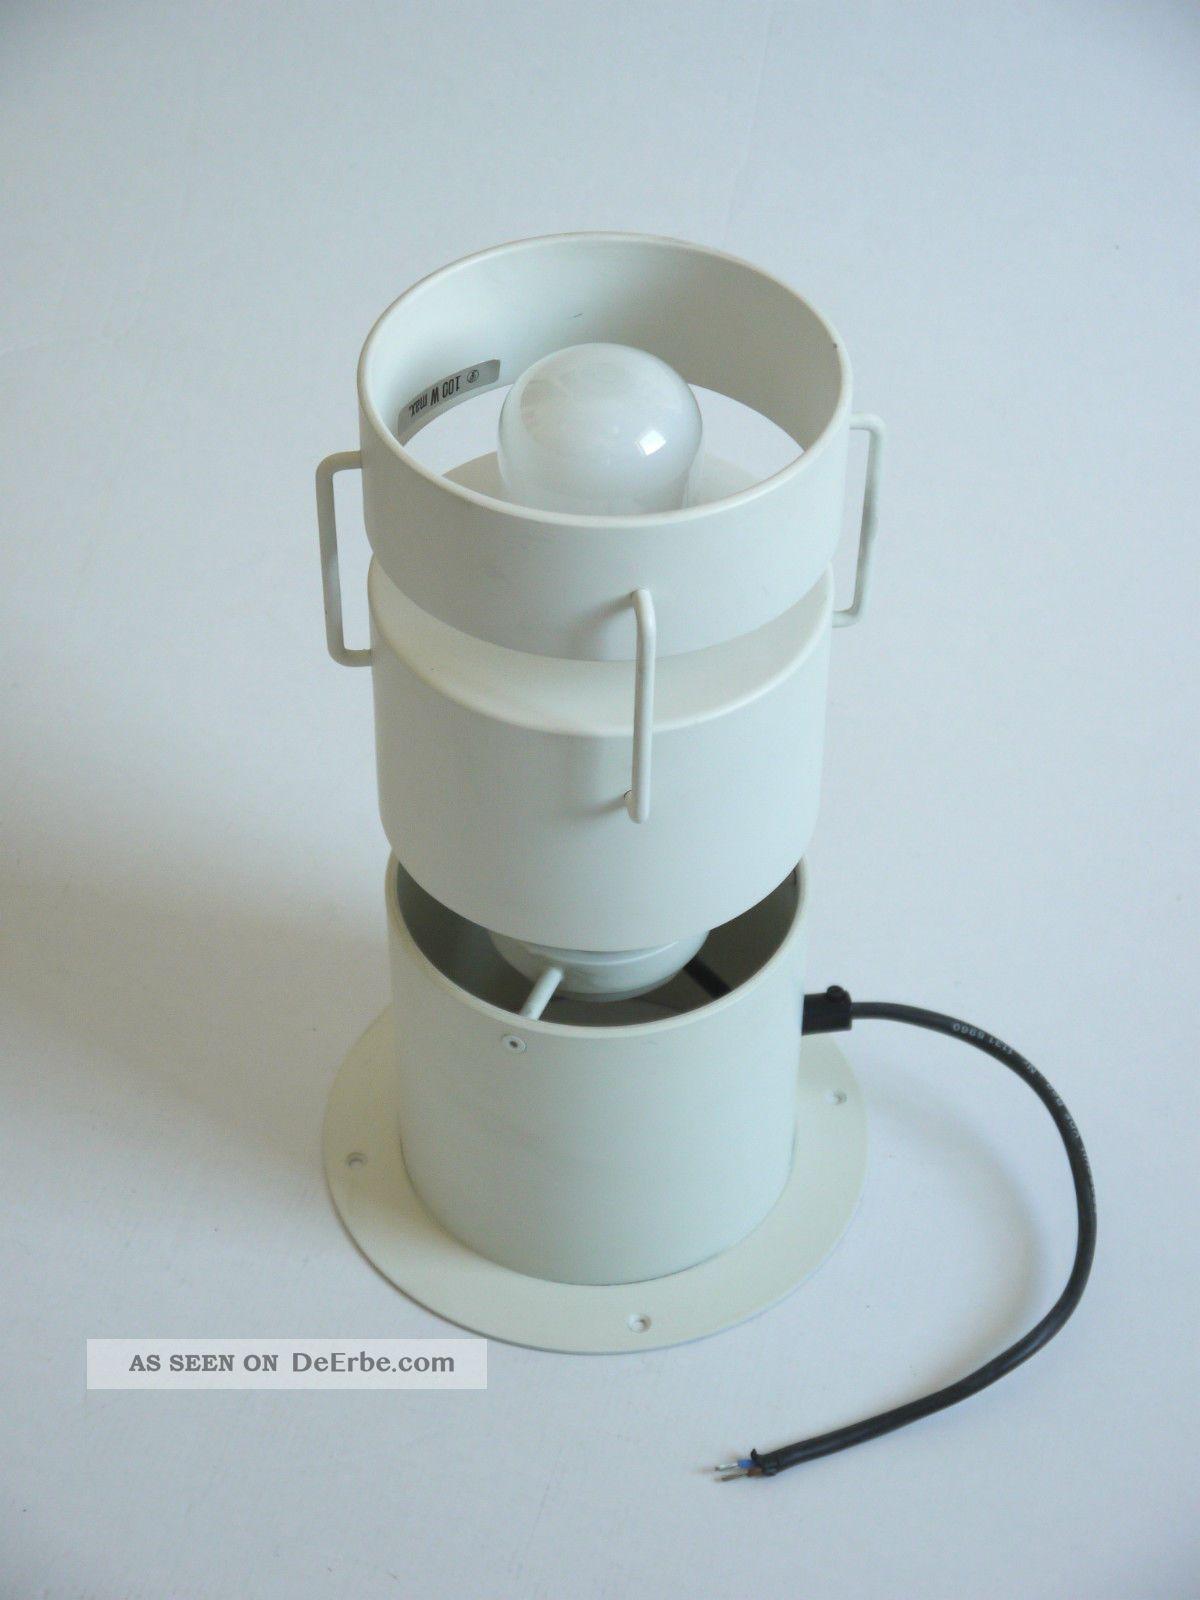 1v 3 louis poulsen lamp 80s danish design lampe loft for Eames lampe